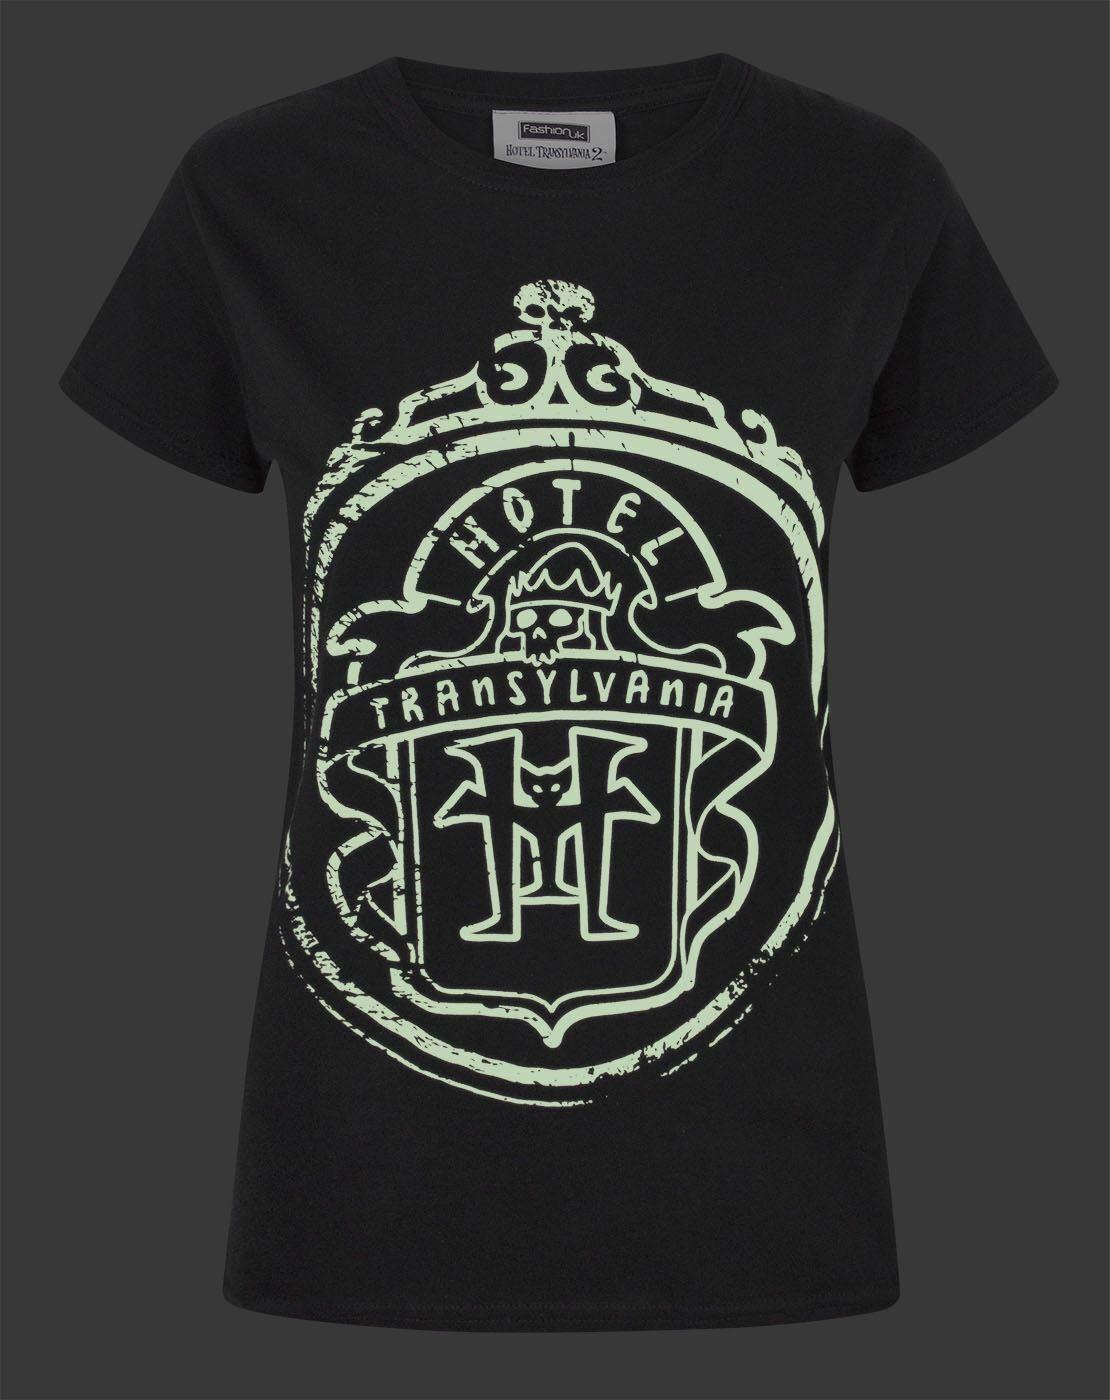 thumbnail 7 - Hotel-Transylvania-Logo-Glow-In-The-Dark-Women-039-s-T-Shirt